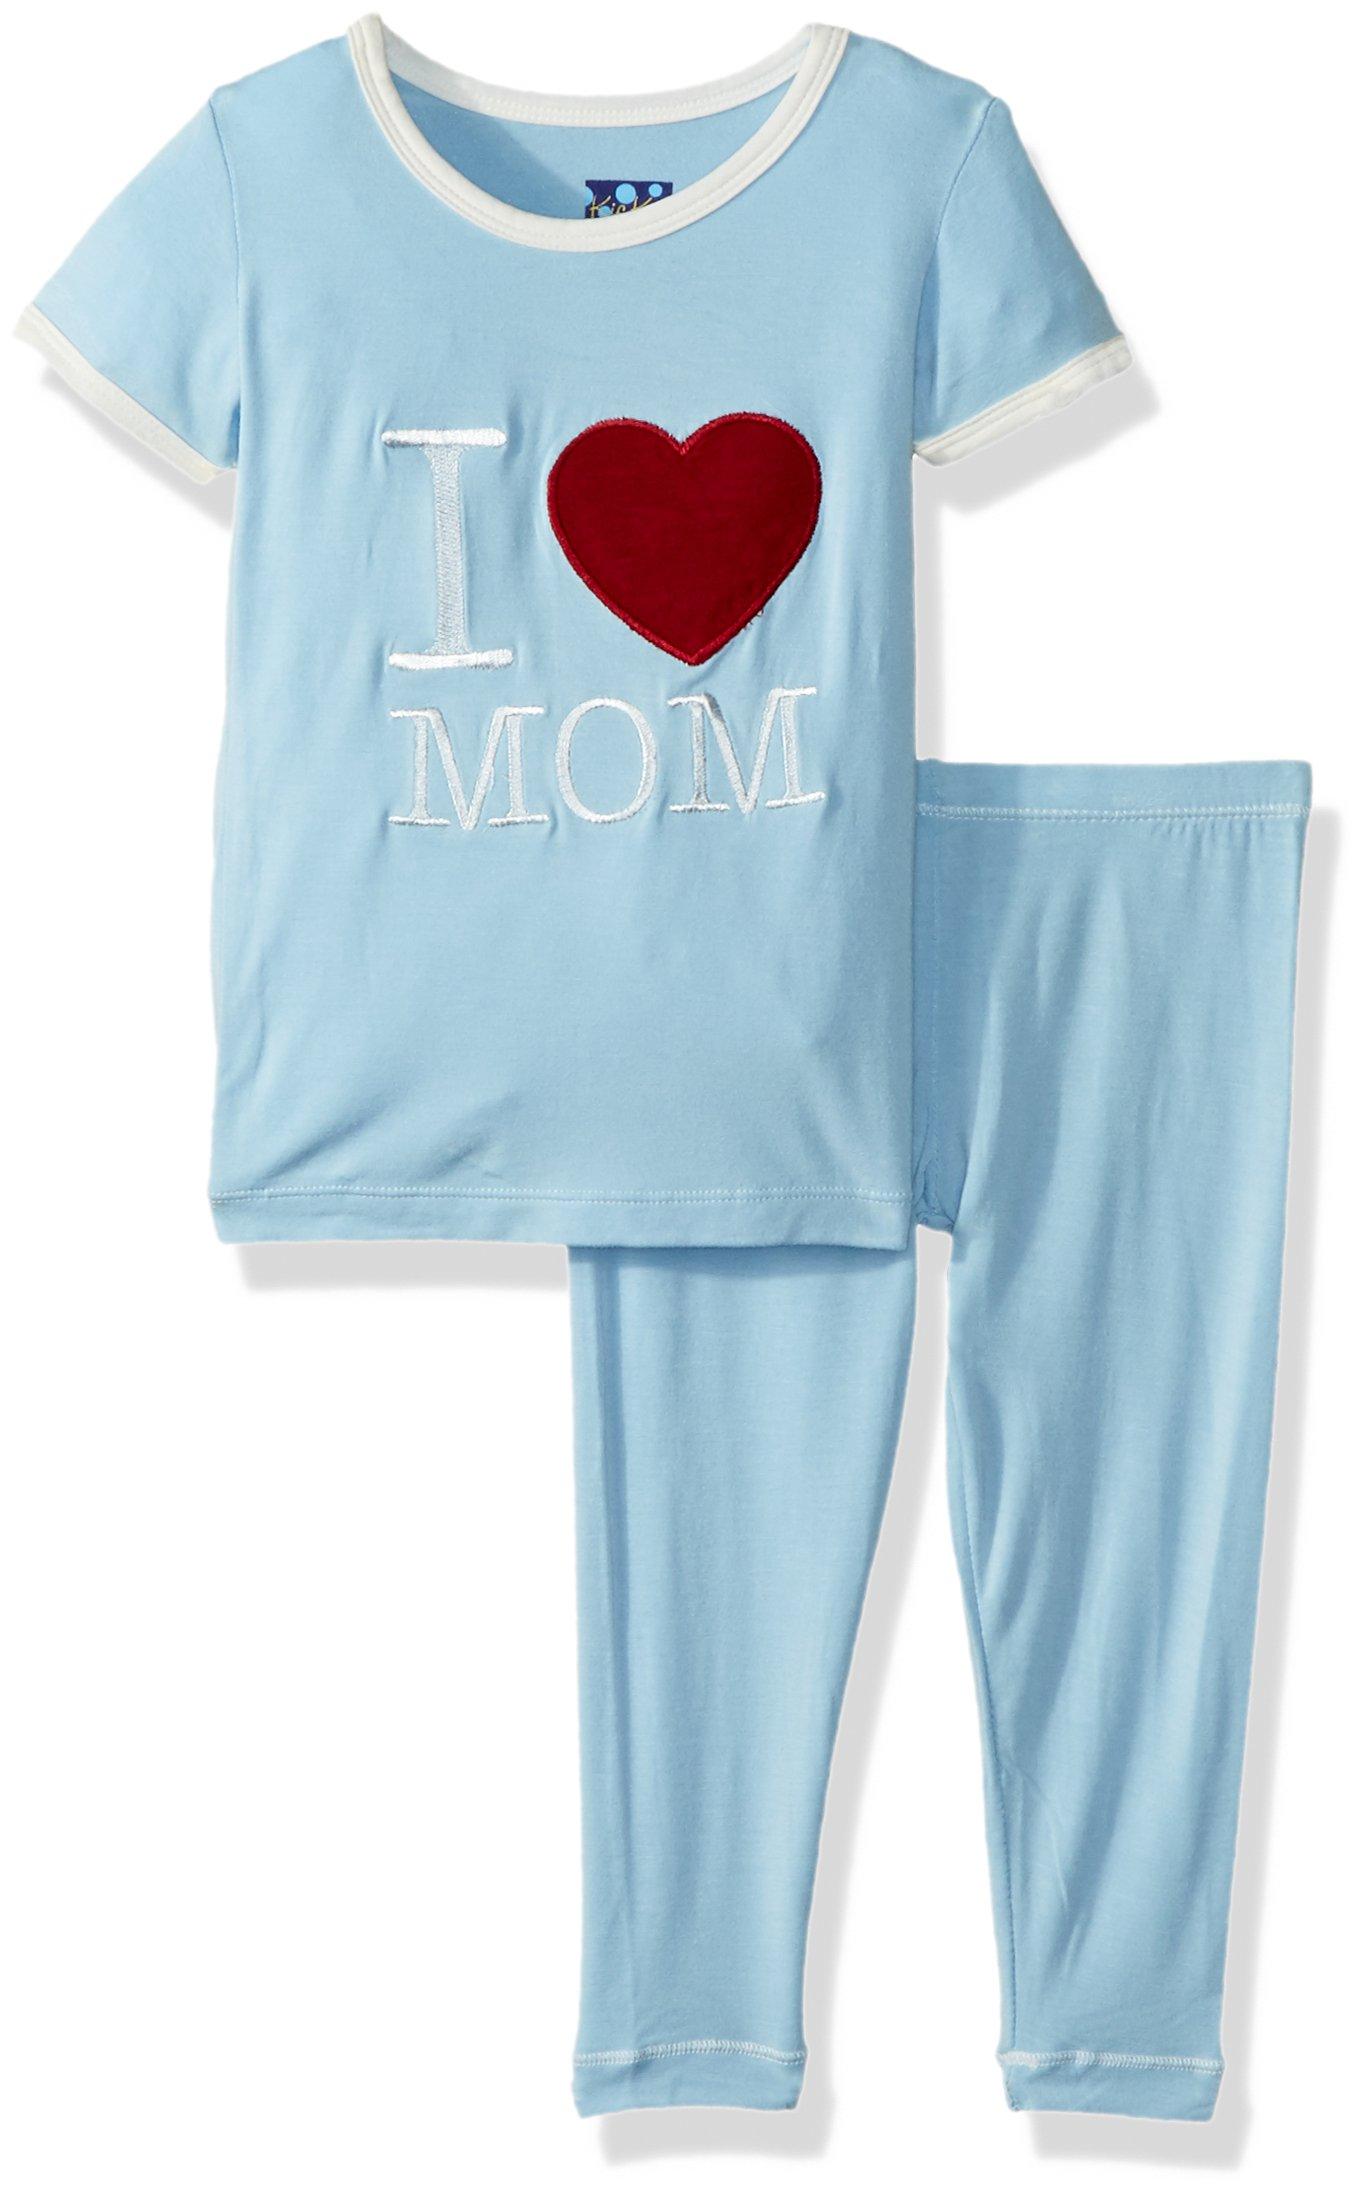 Kickee Pants Baby Boys Holiday Short Sleeve Applique Pajama Set, Pond I Love Mom, 12-18m by Kickee Pants (Image #1)